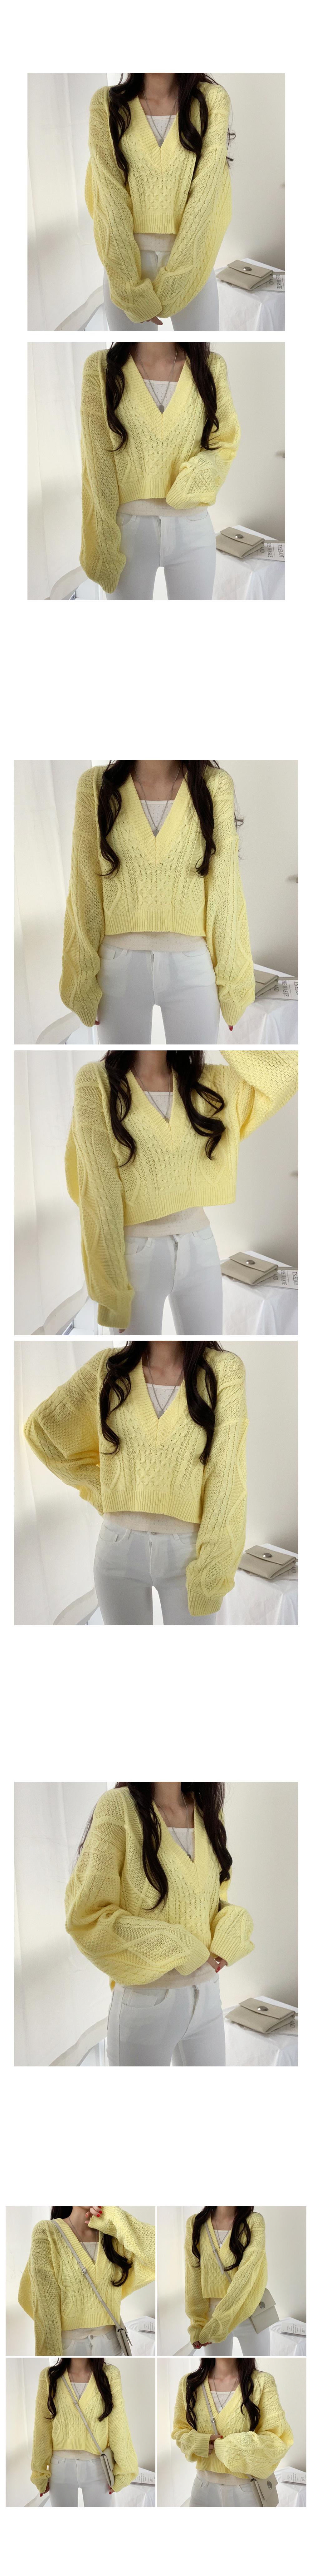 Spring Twisted V Crop Knitwear